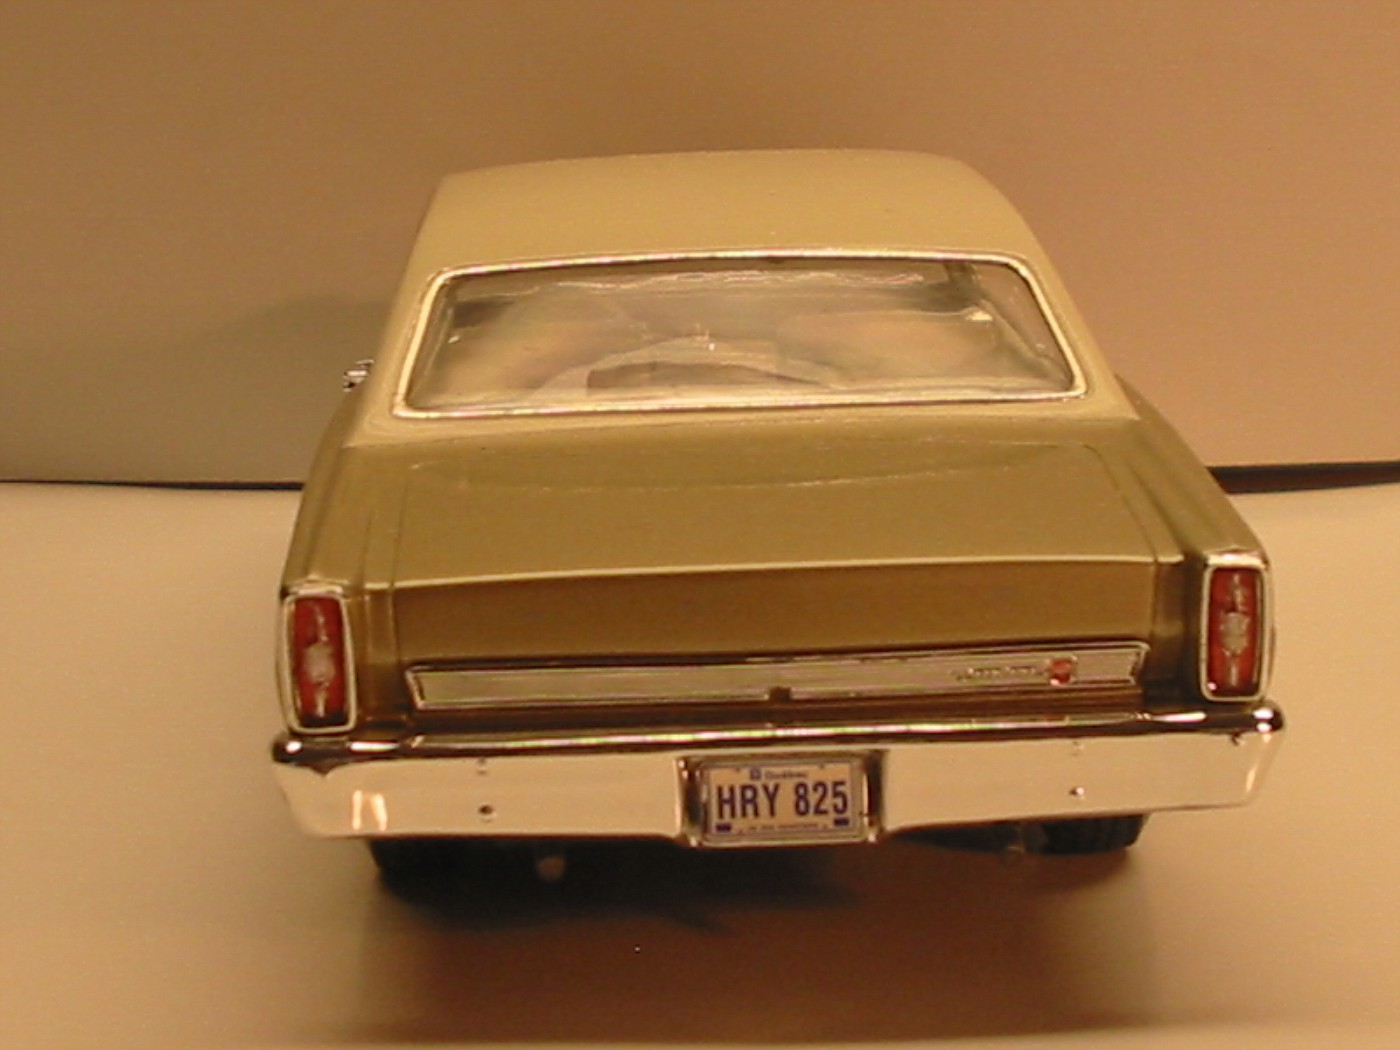 1966 Ford Fairlane GT IMG_0004-vi